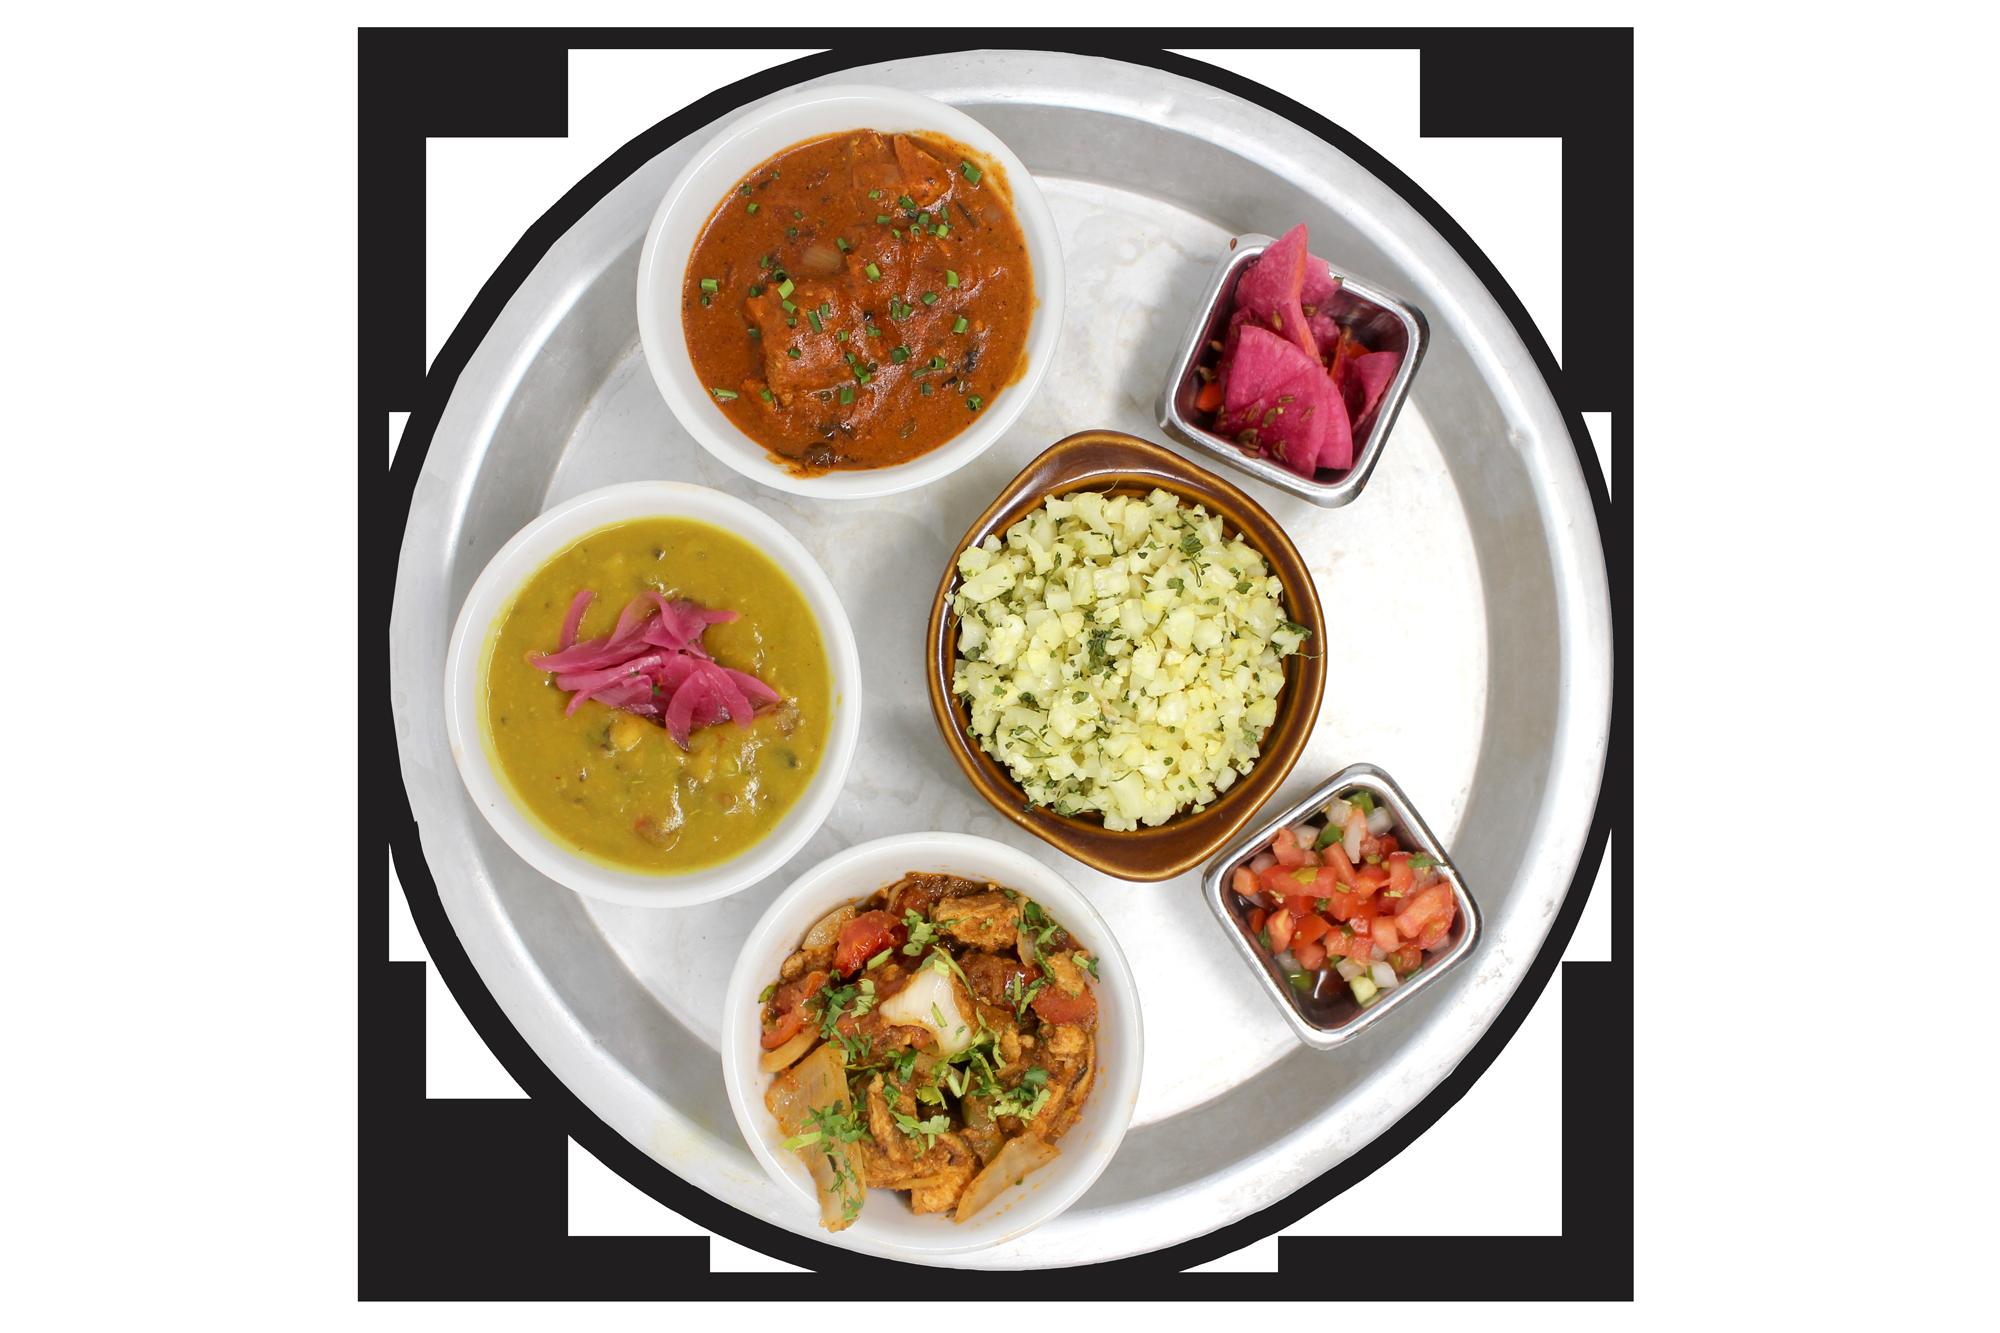 LITE THALI   riced cauliflower, daal lentils, kadhai chicken or free range plant protein (V), chicken or paneer (VG) tikka masala, pico & pickles